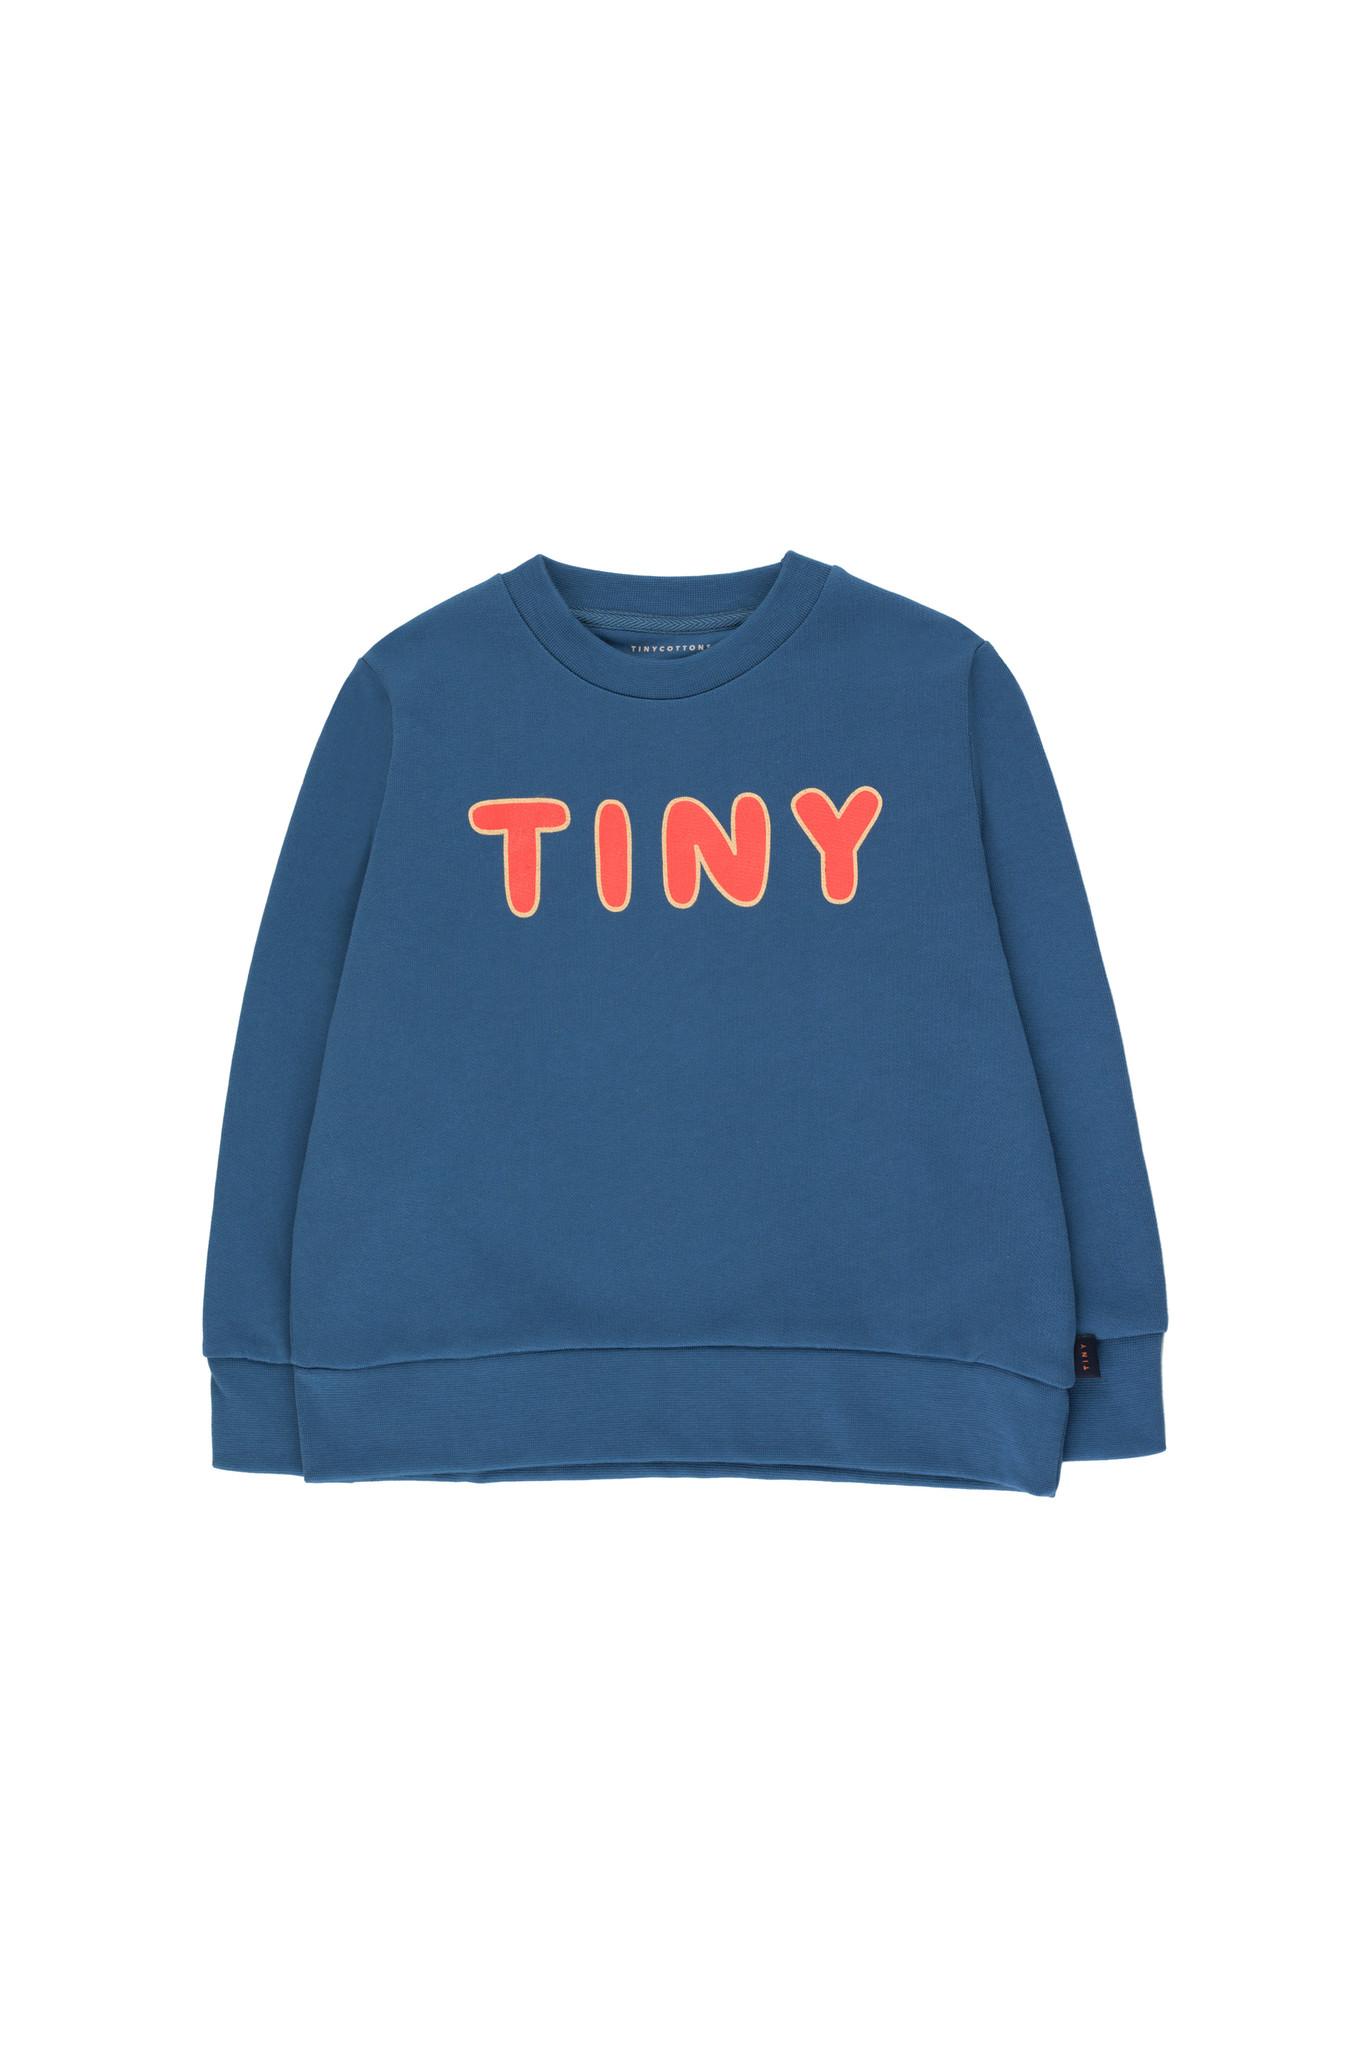 TINY SWEATSHIRT - Summer Navy / Red-1